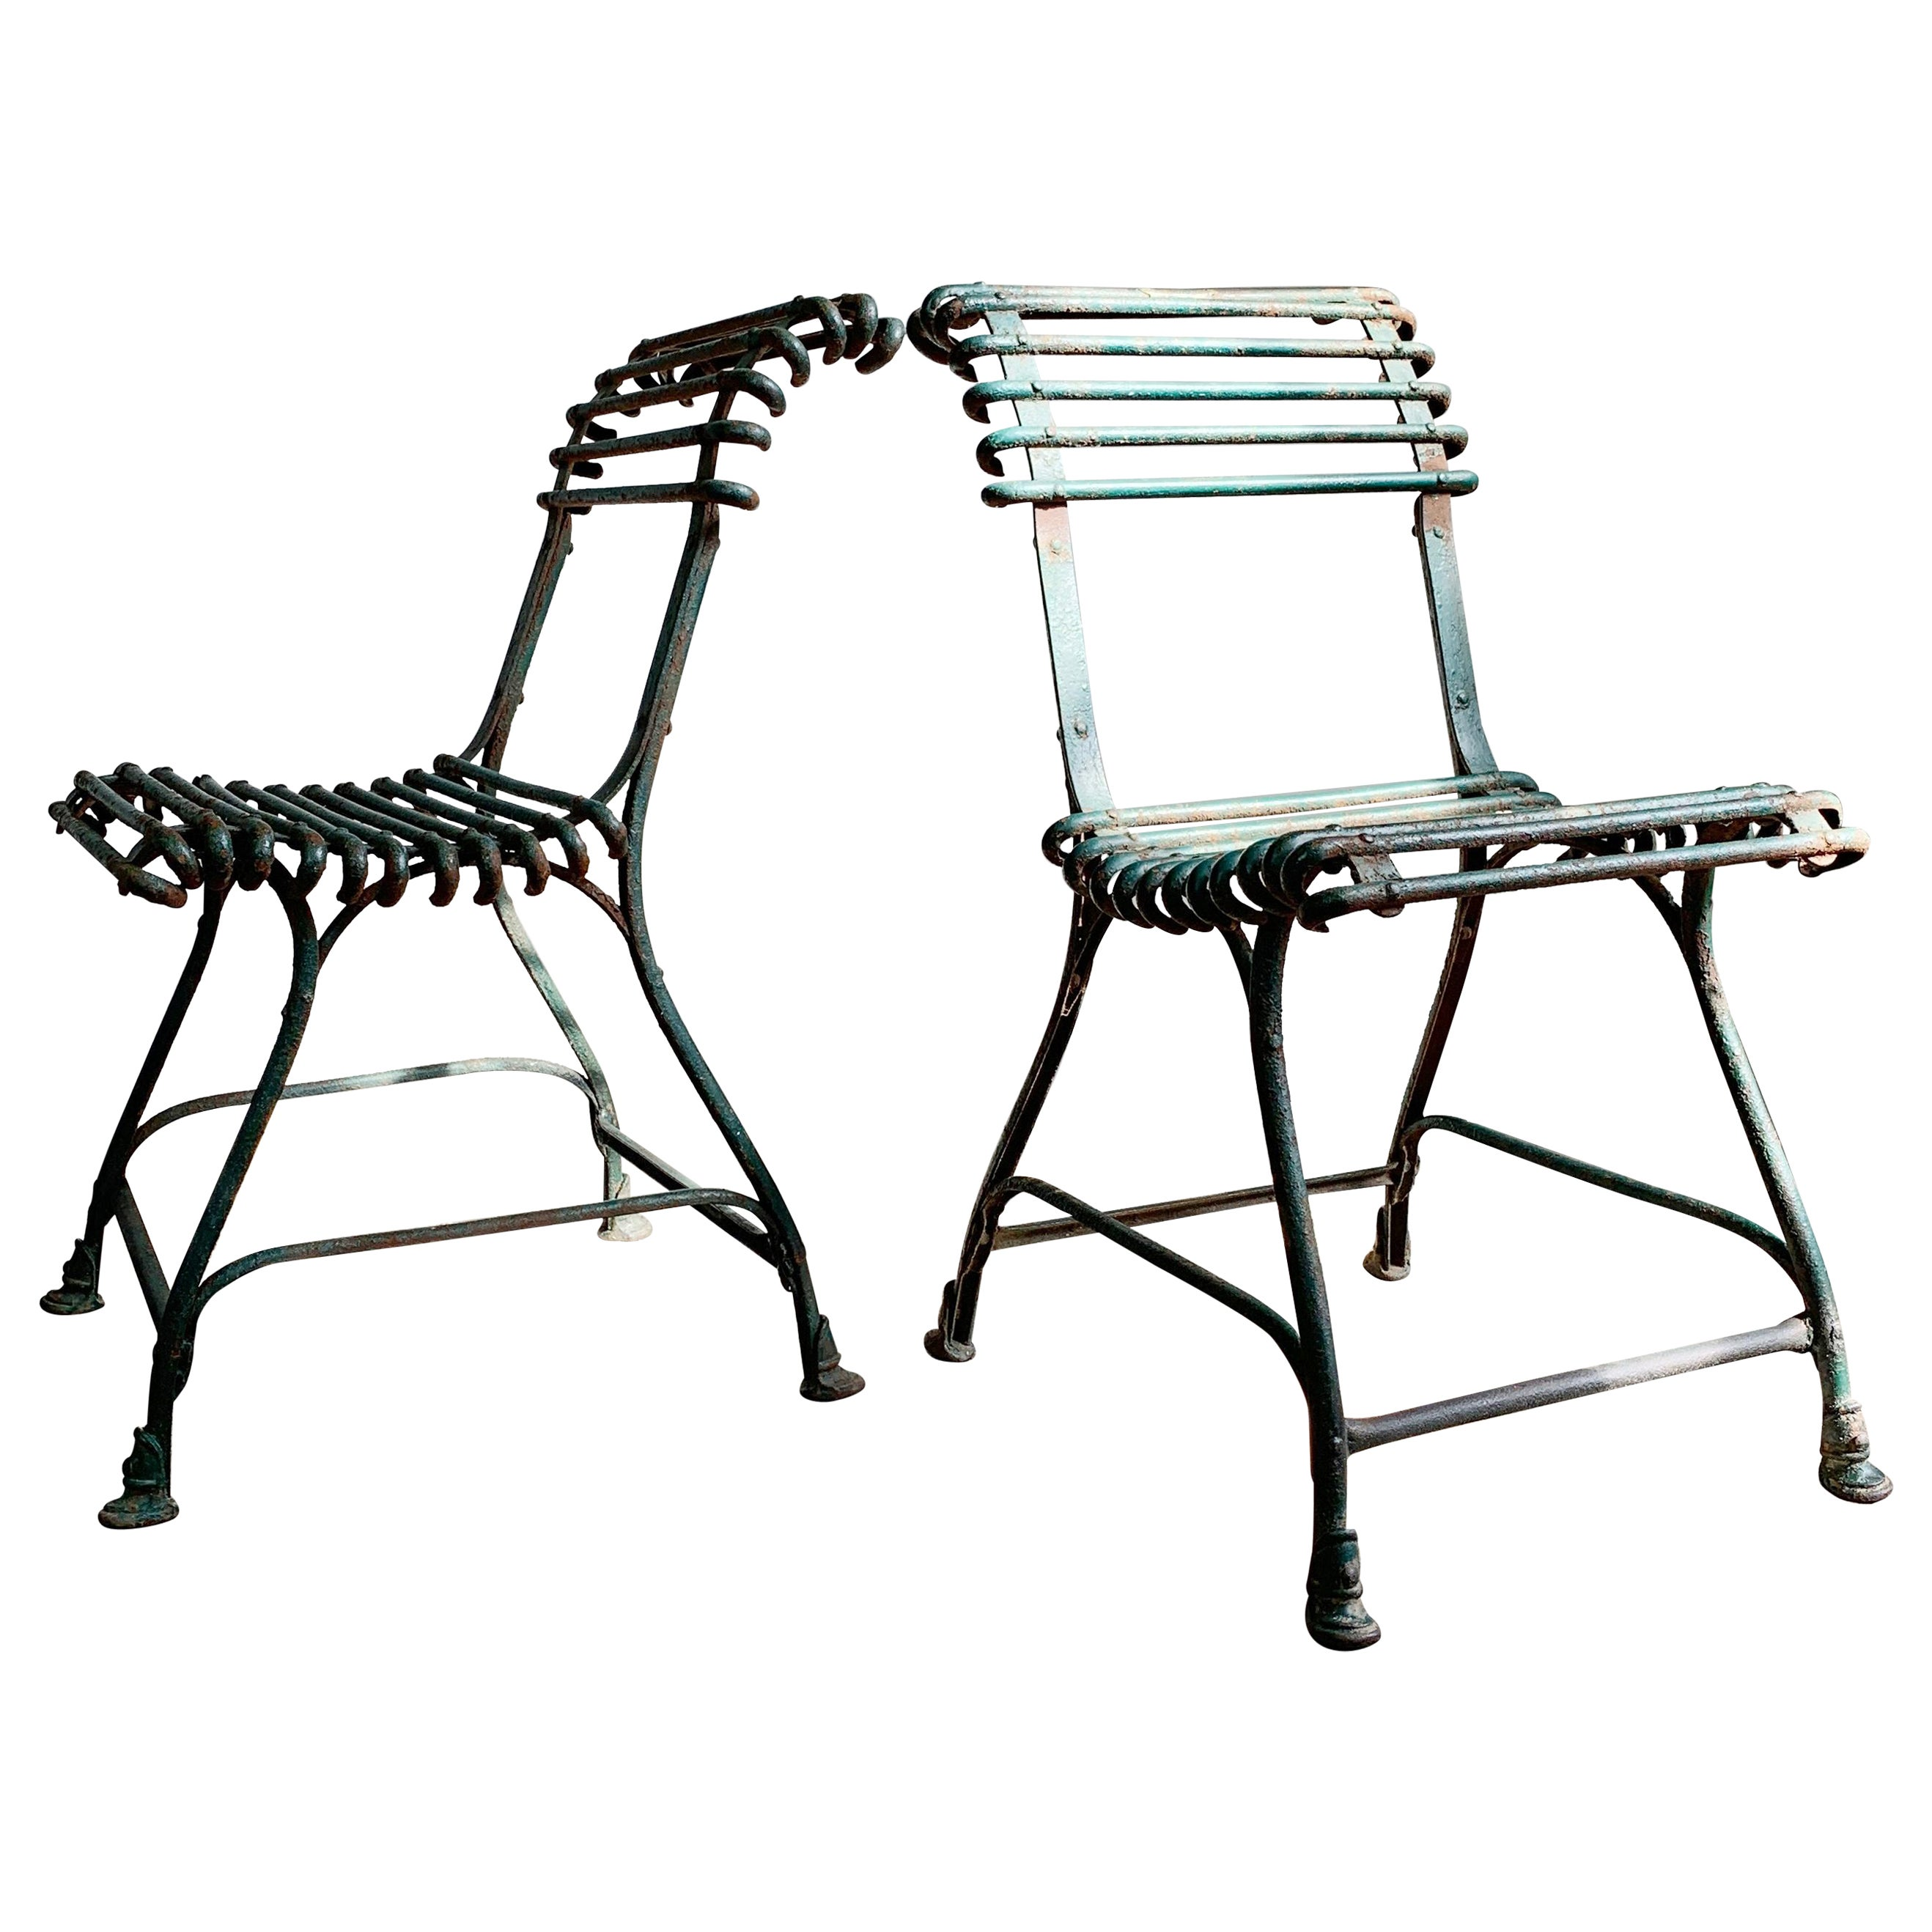 Pair of Arras Saint Sauveur Garden Chairs, circa 1910